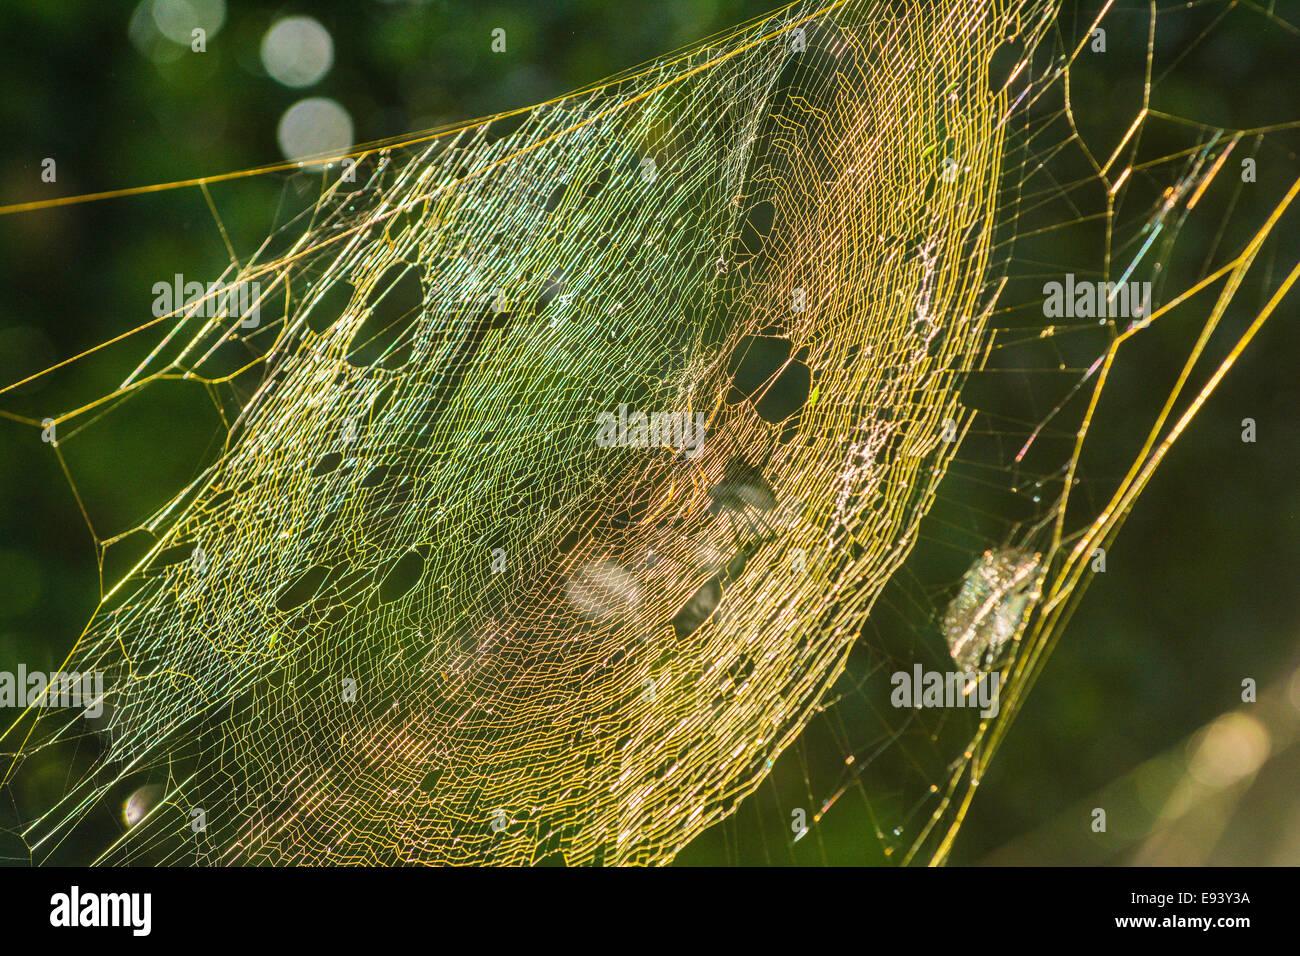 Golden Orb Weaver spider casting a shadow on its web , Mt. Cootha Botanic Garden, Brisbane, Queensland, Australia - Stock Image